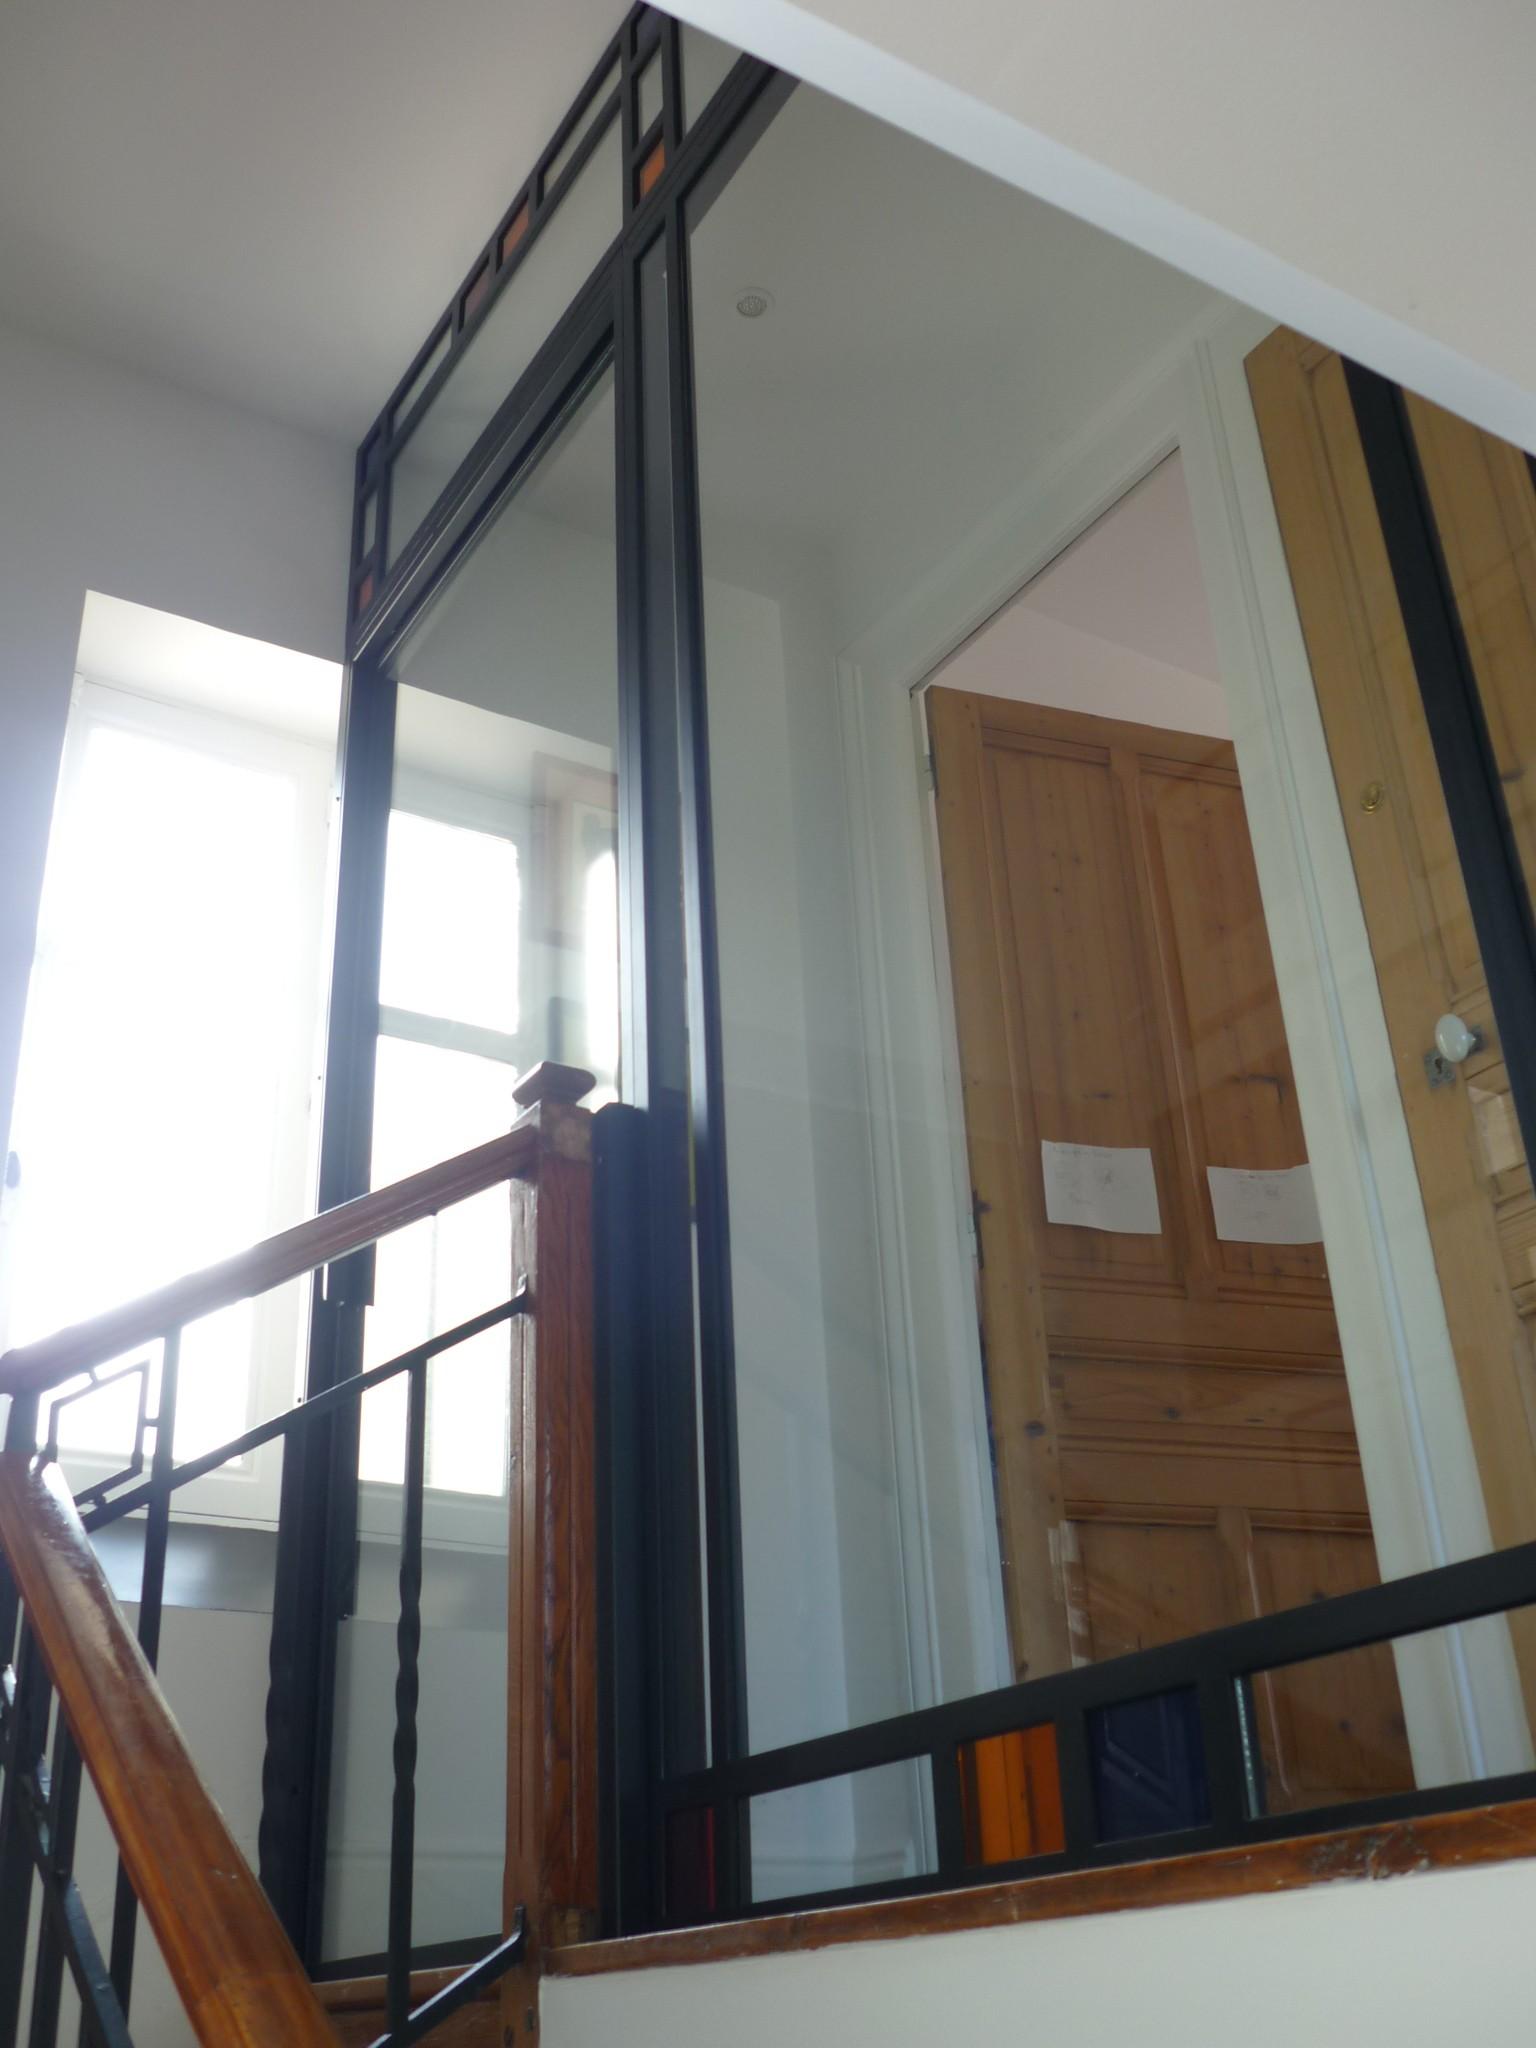 verri re art d co 69 your steel. Black Bedroom Furniture Sets. Home Design Ideas